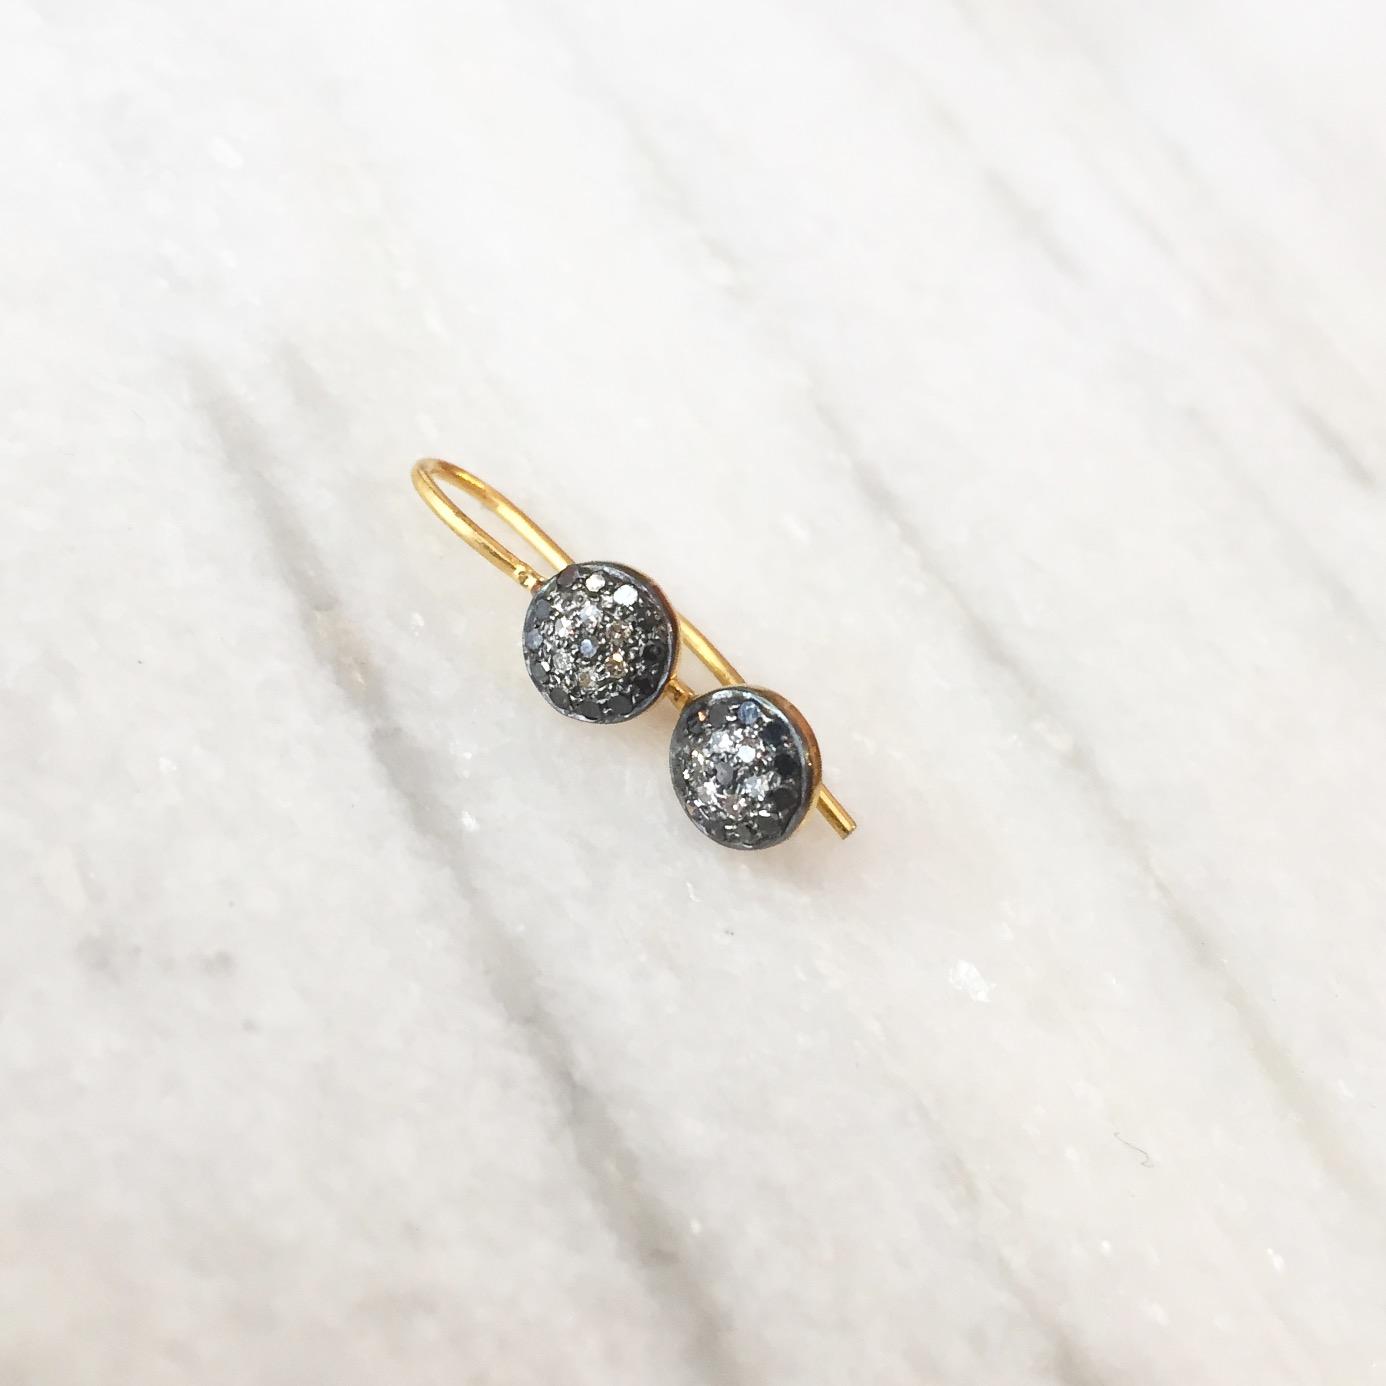 COOKIE earrings | Vermeil & diamonds  Dormeuses COOKIE | Vermeil &  diamants     — Calame Palma